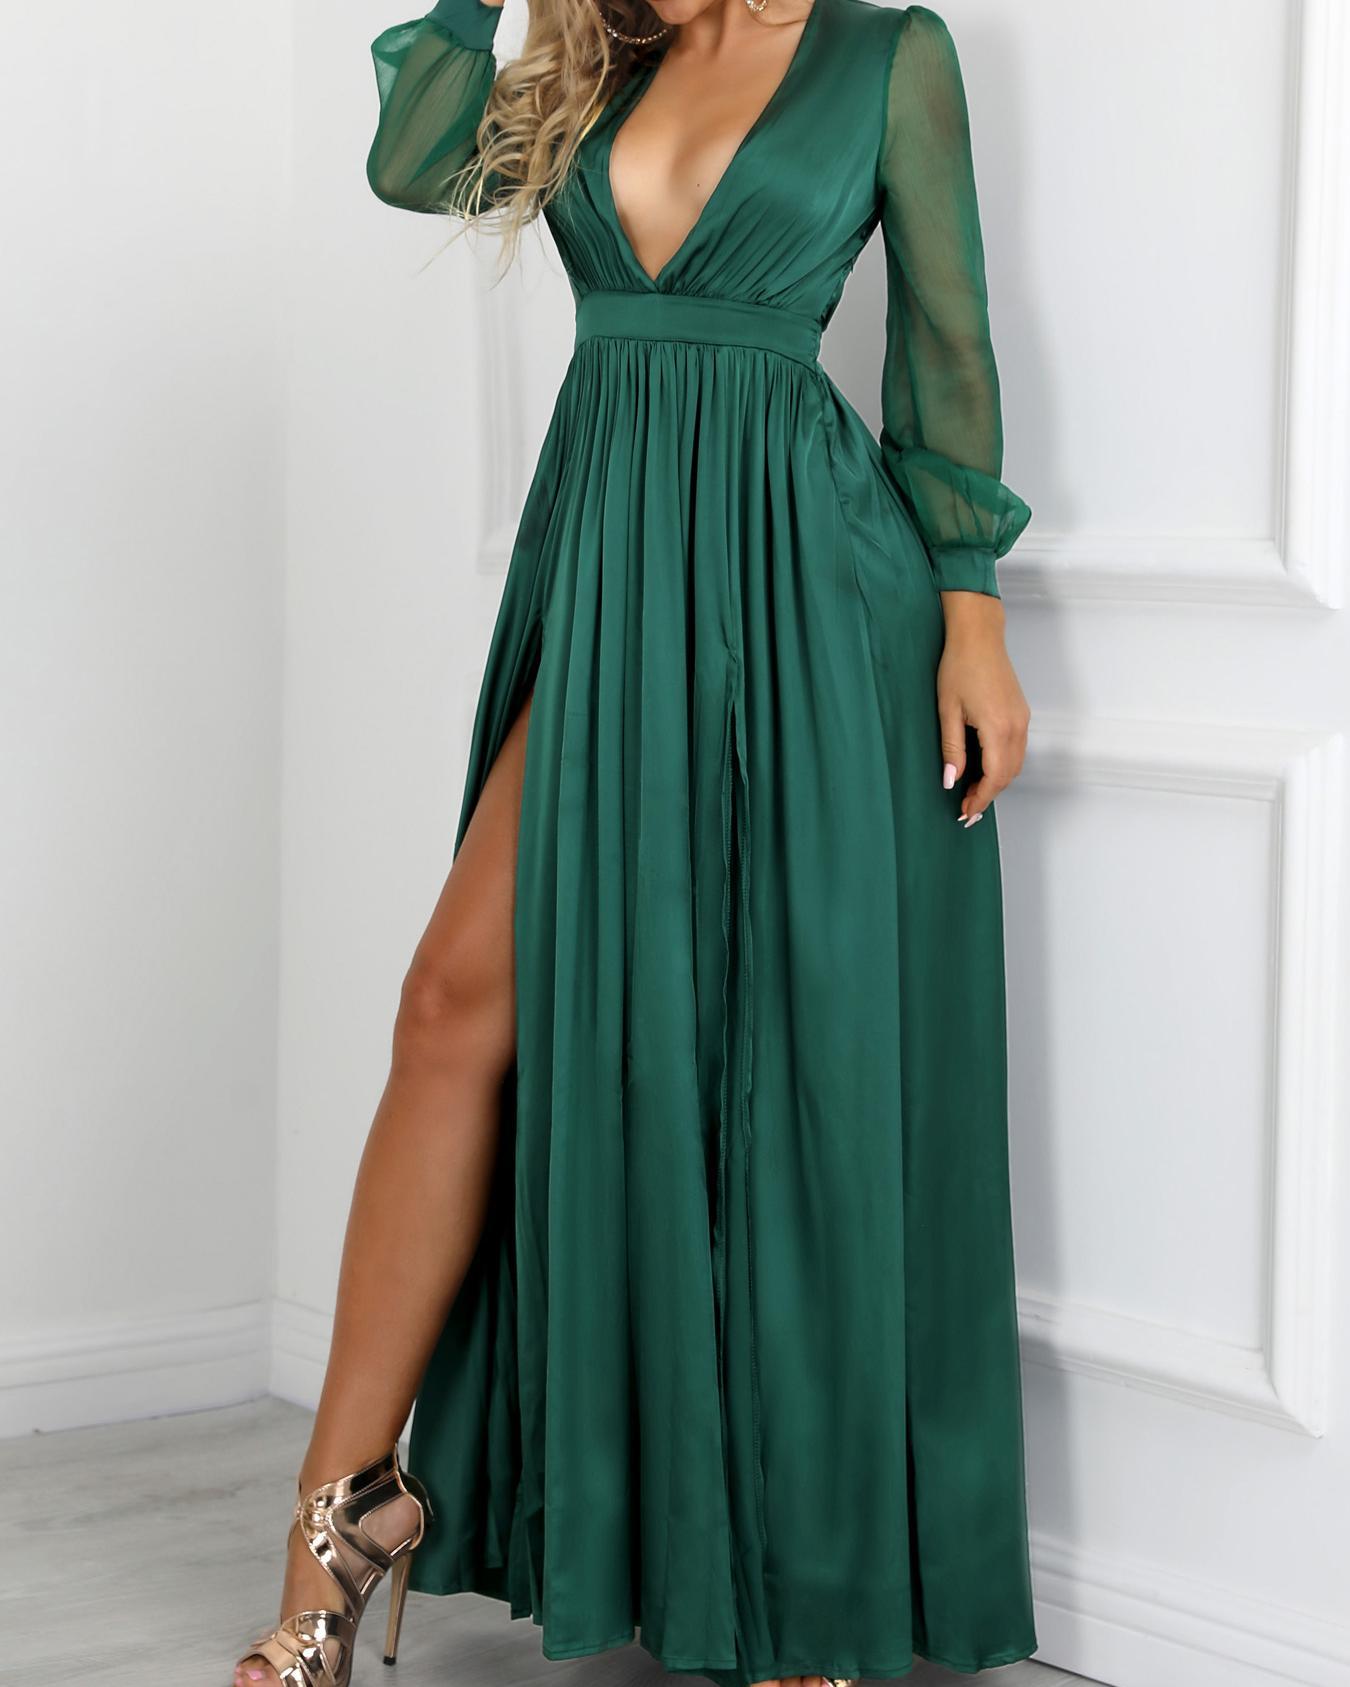 Plunge Lantern Sleeve Pleated Slit Evening Dress, Green